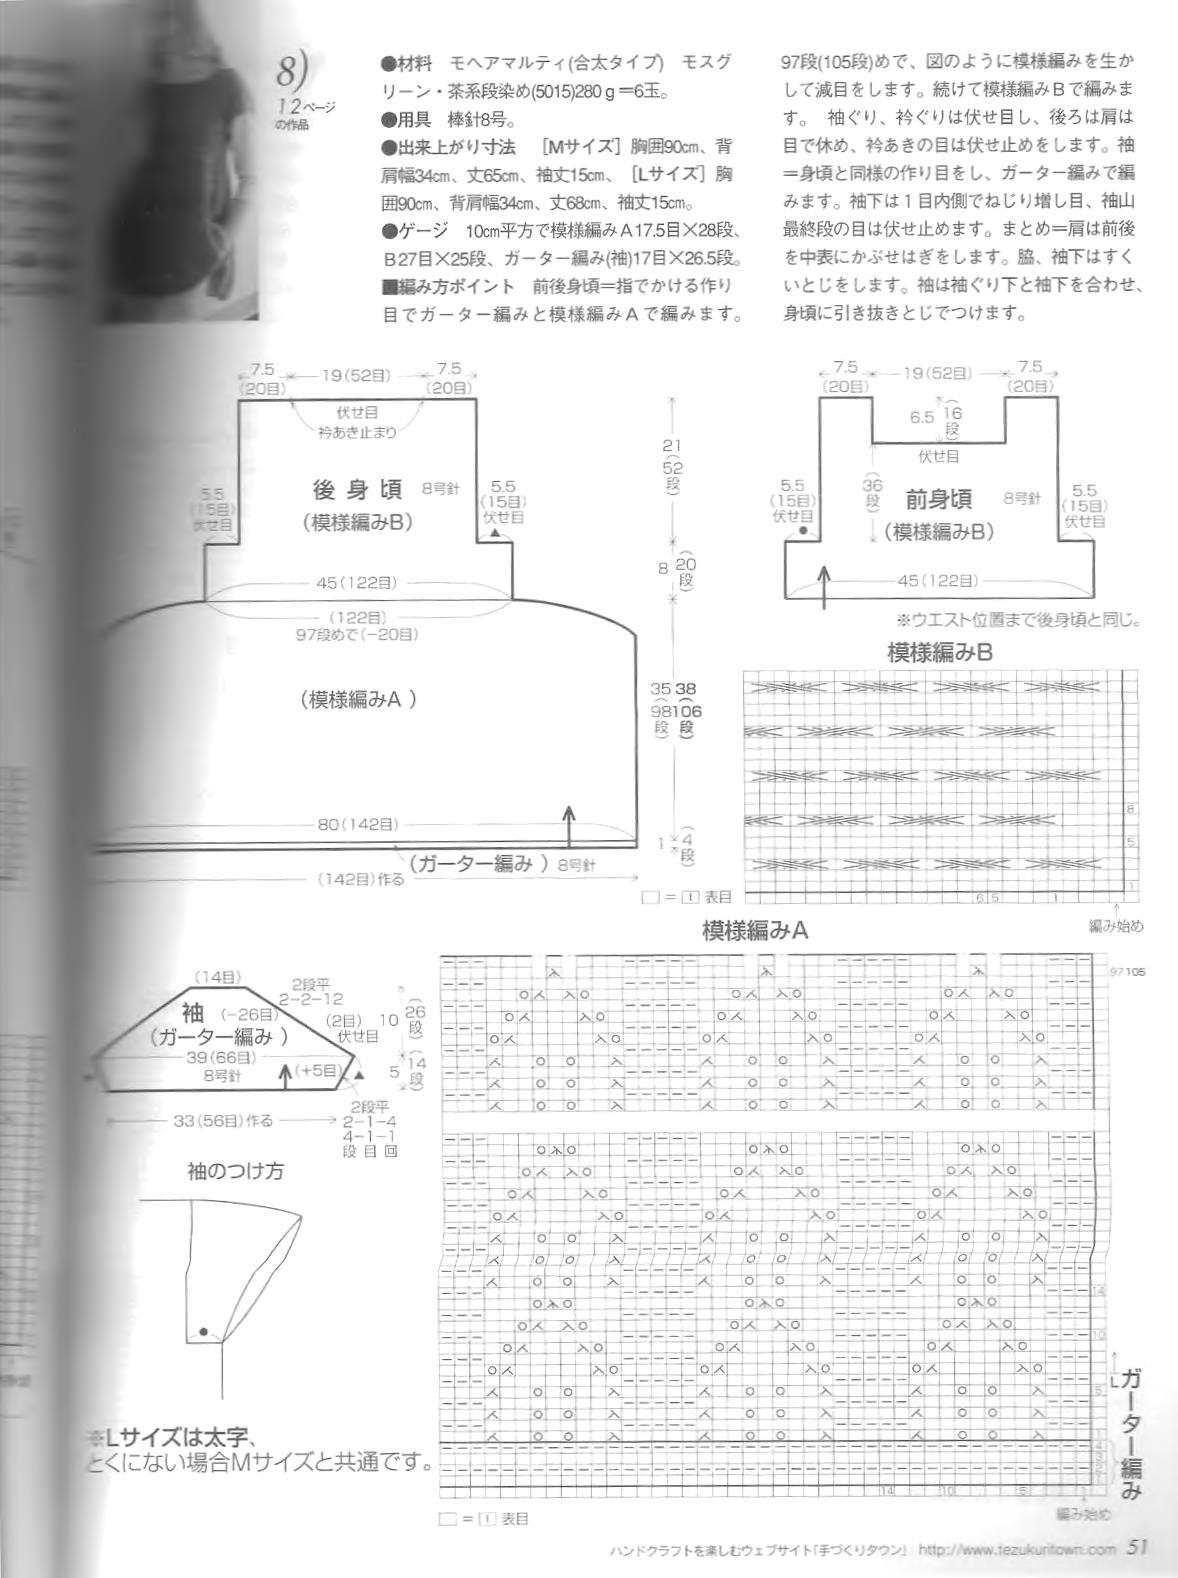 Let's knit series NV4375 2008 M-L sp-kr_51